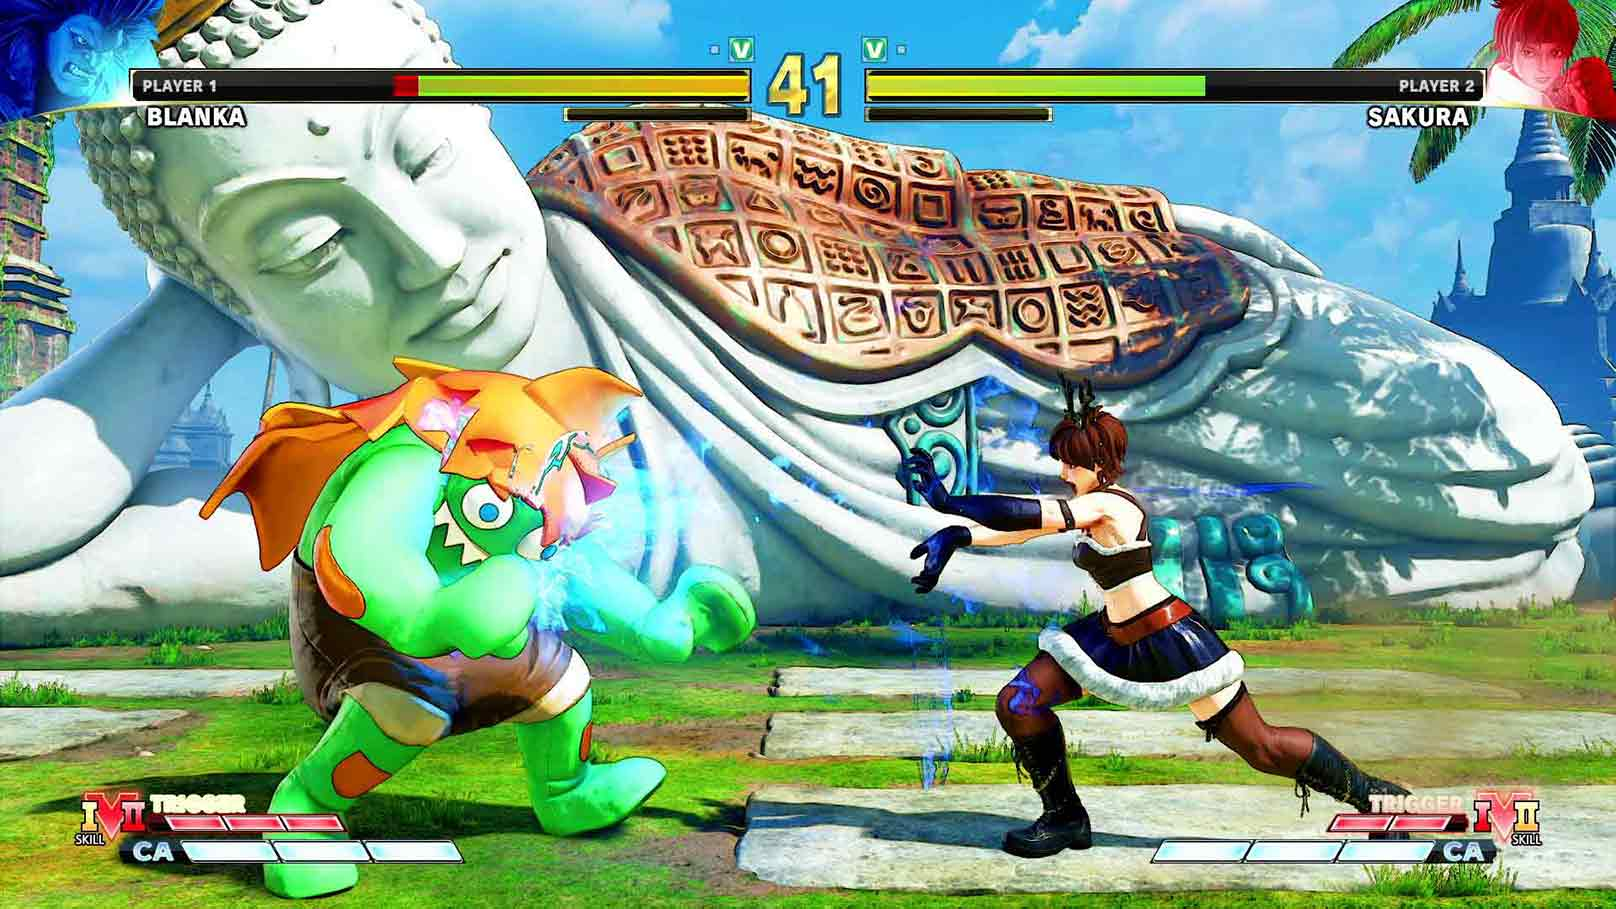 Street-Fighter-V-ศึกไฟต์-บนท้องถนน2